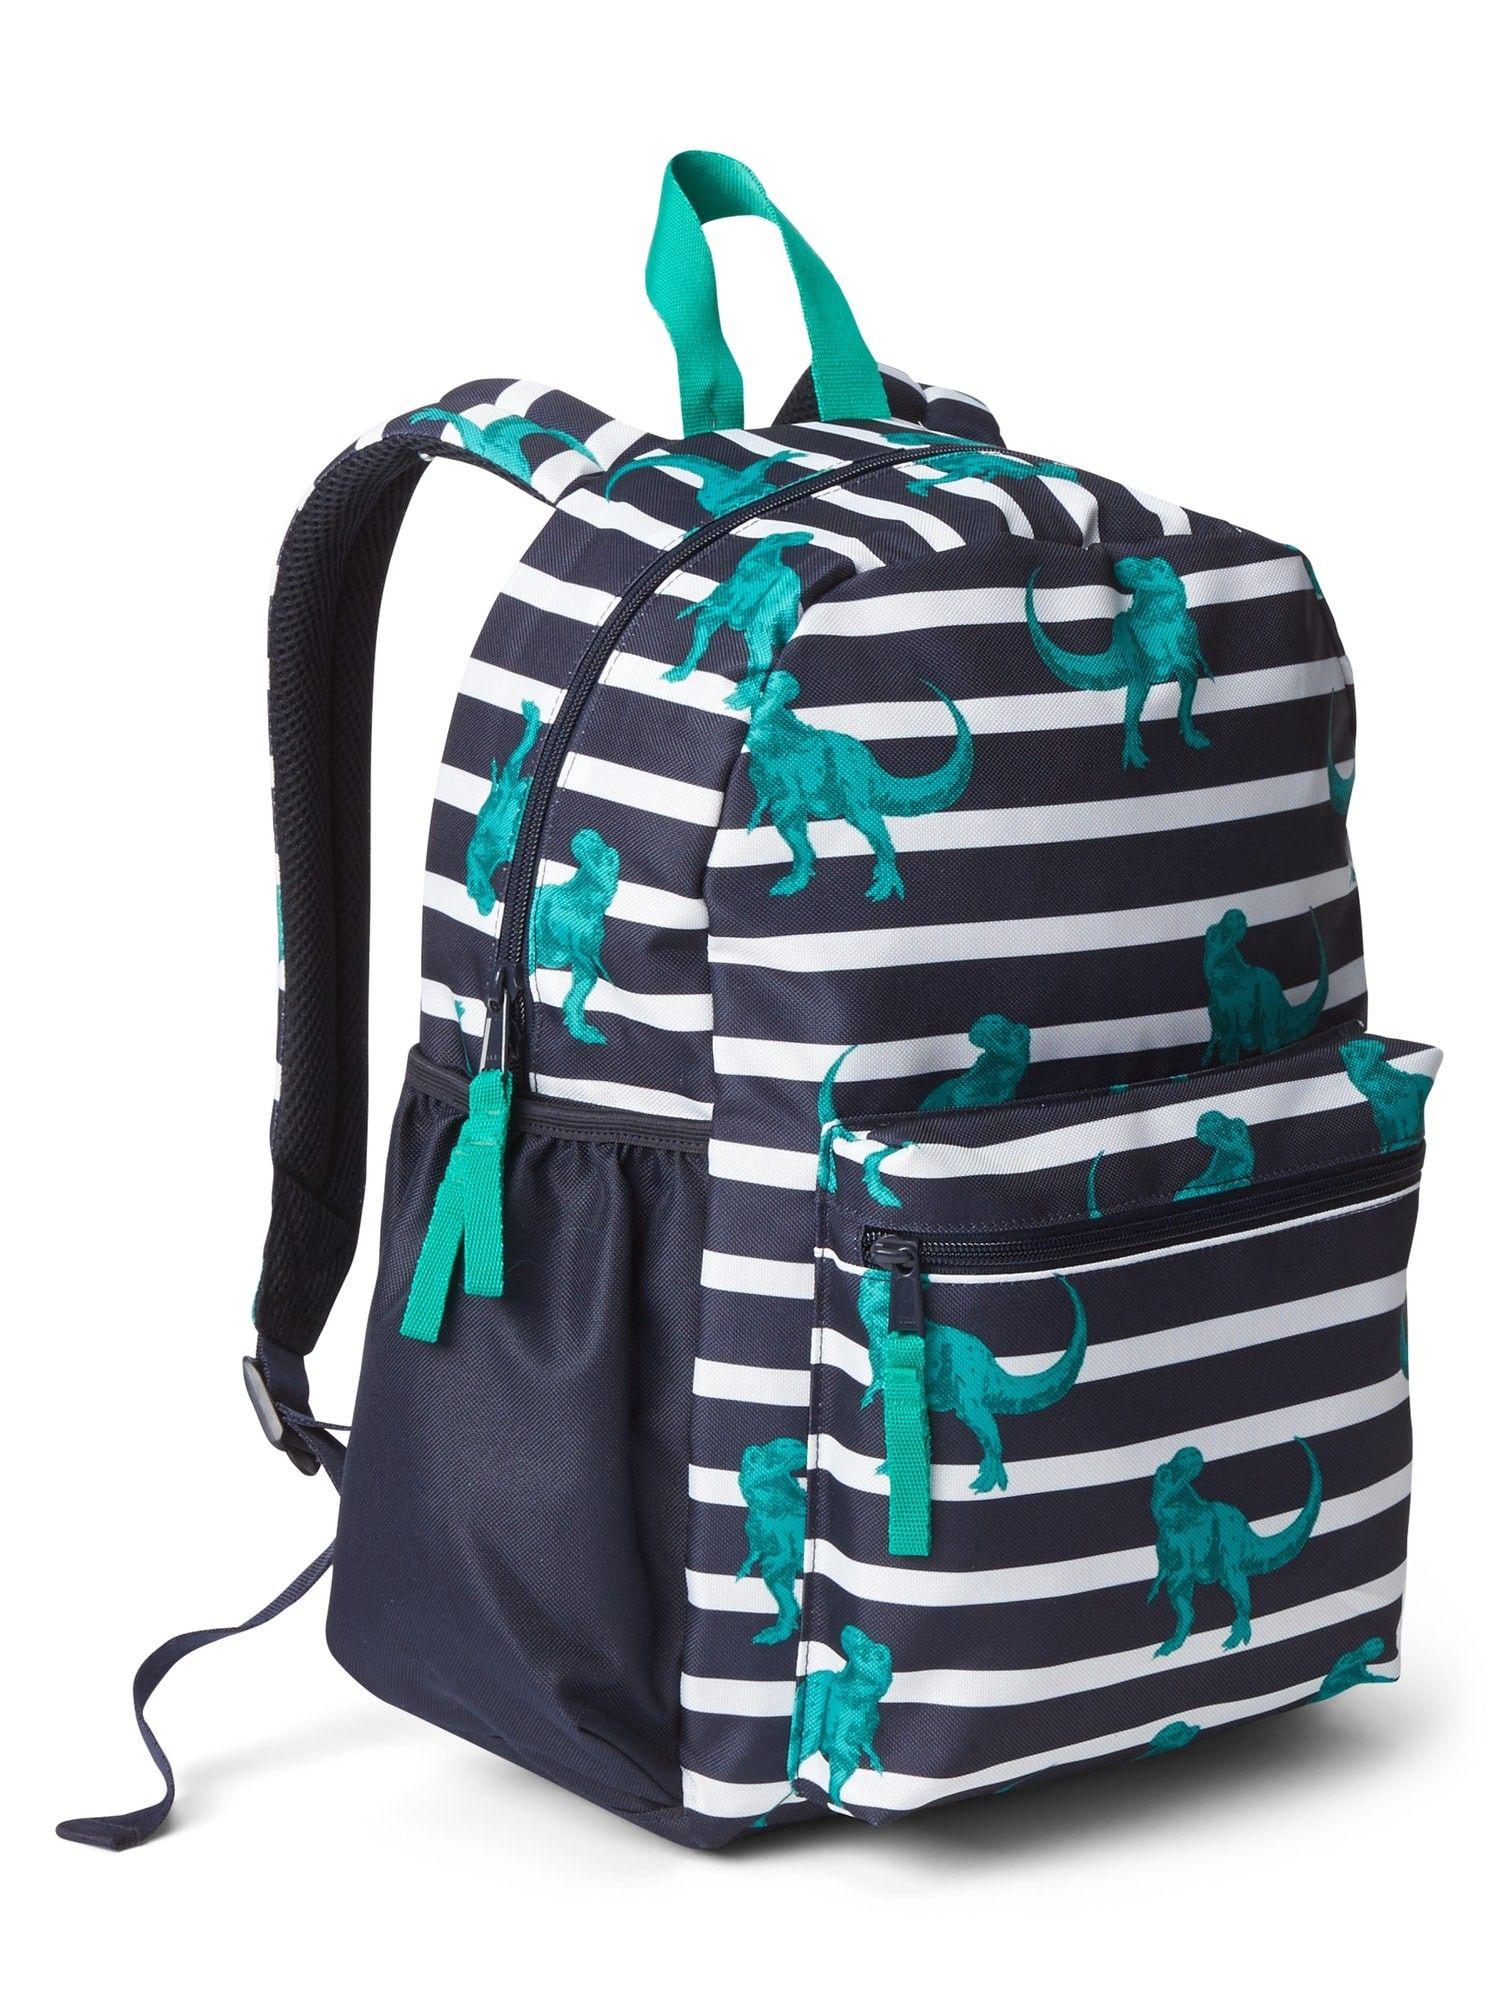 b22703cfddf0 Gap Boys Stripe Dino Backpack - True Indigo One Size